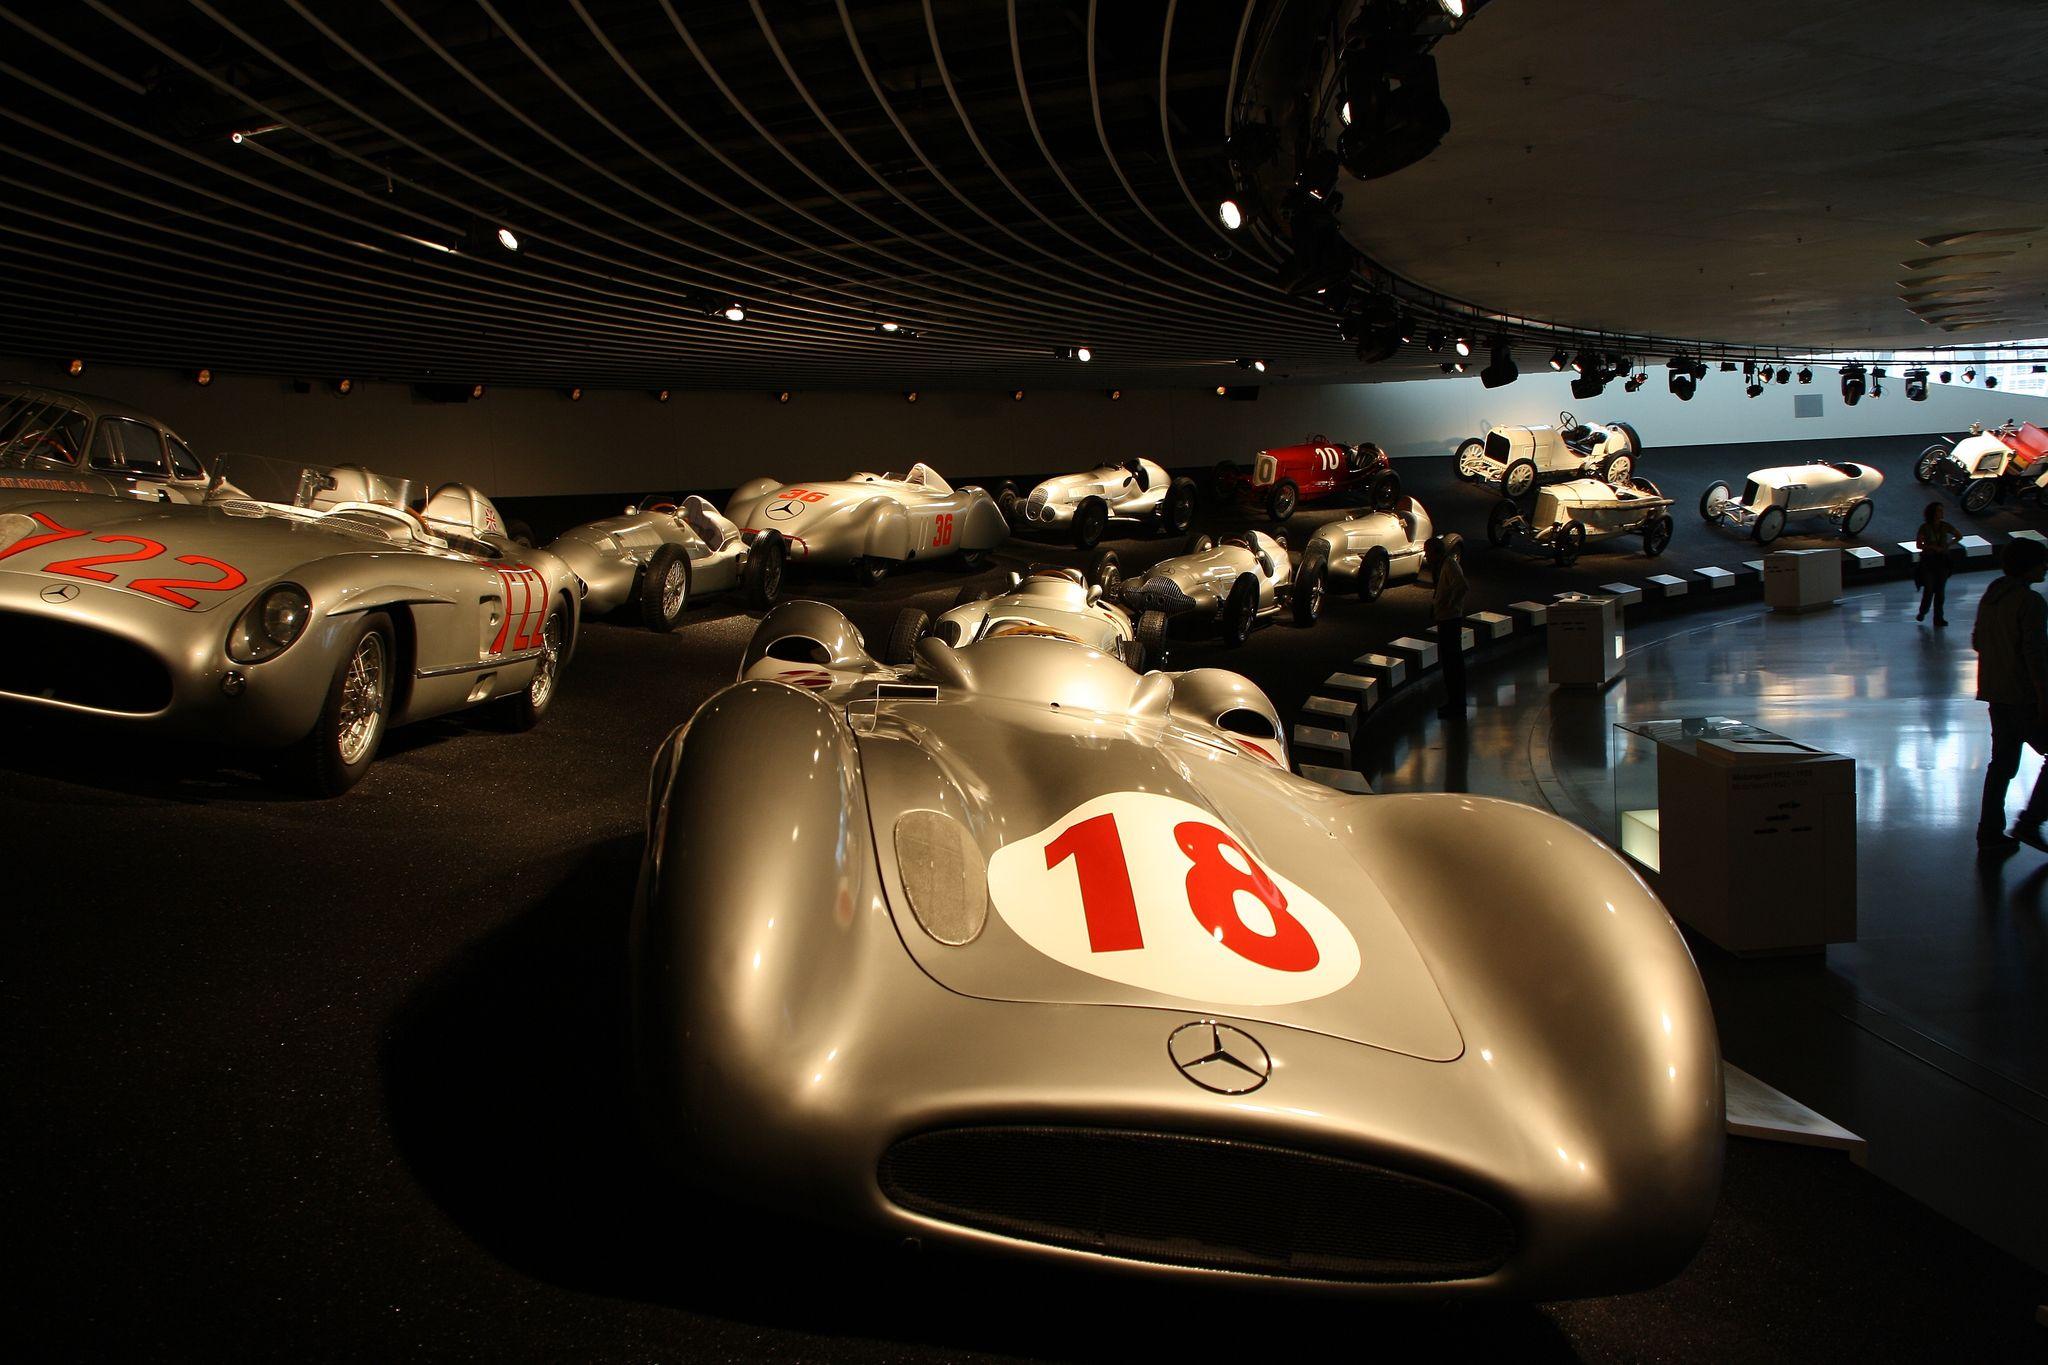 mercedes benz museum2 Mercedes Benz Museum in Stuttgart, Germany